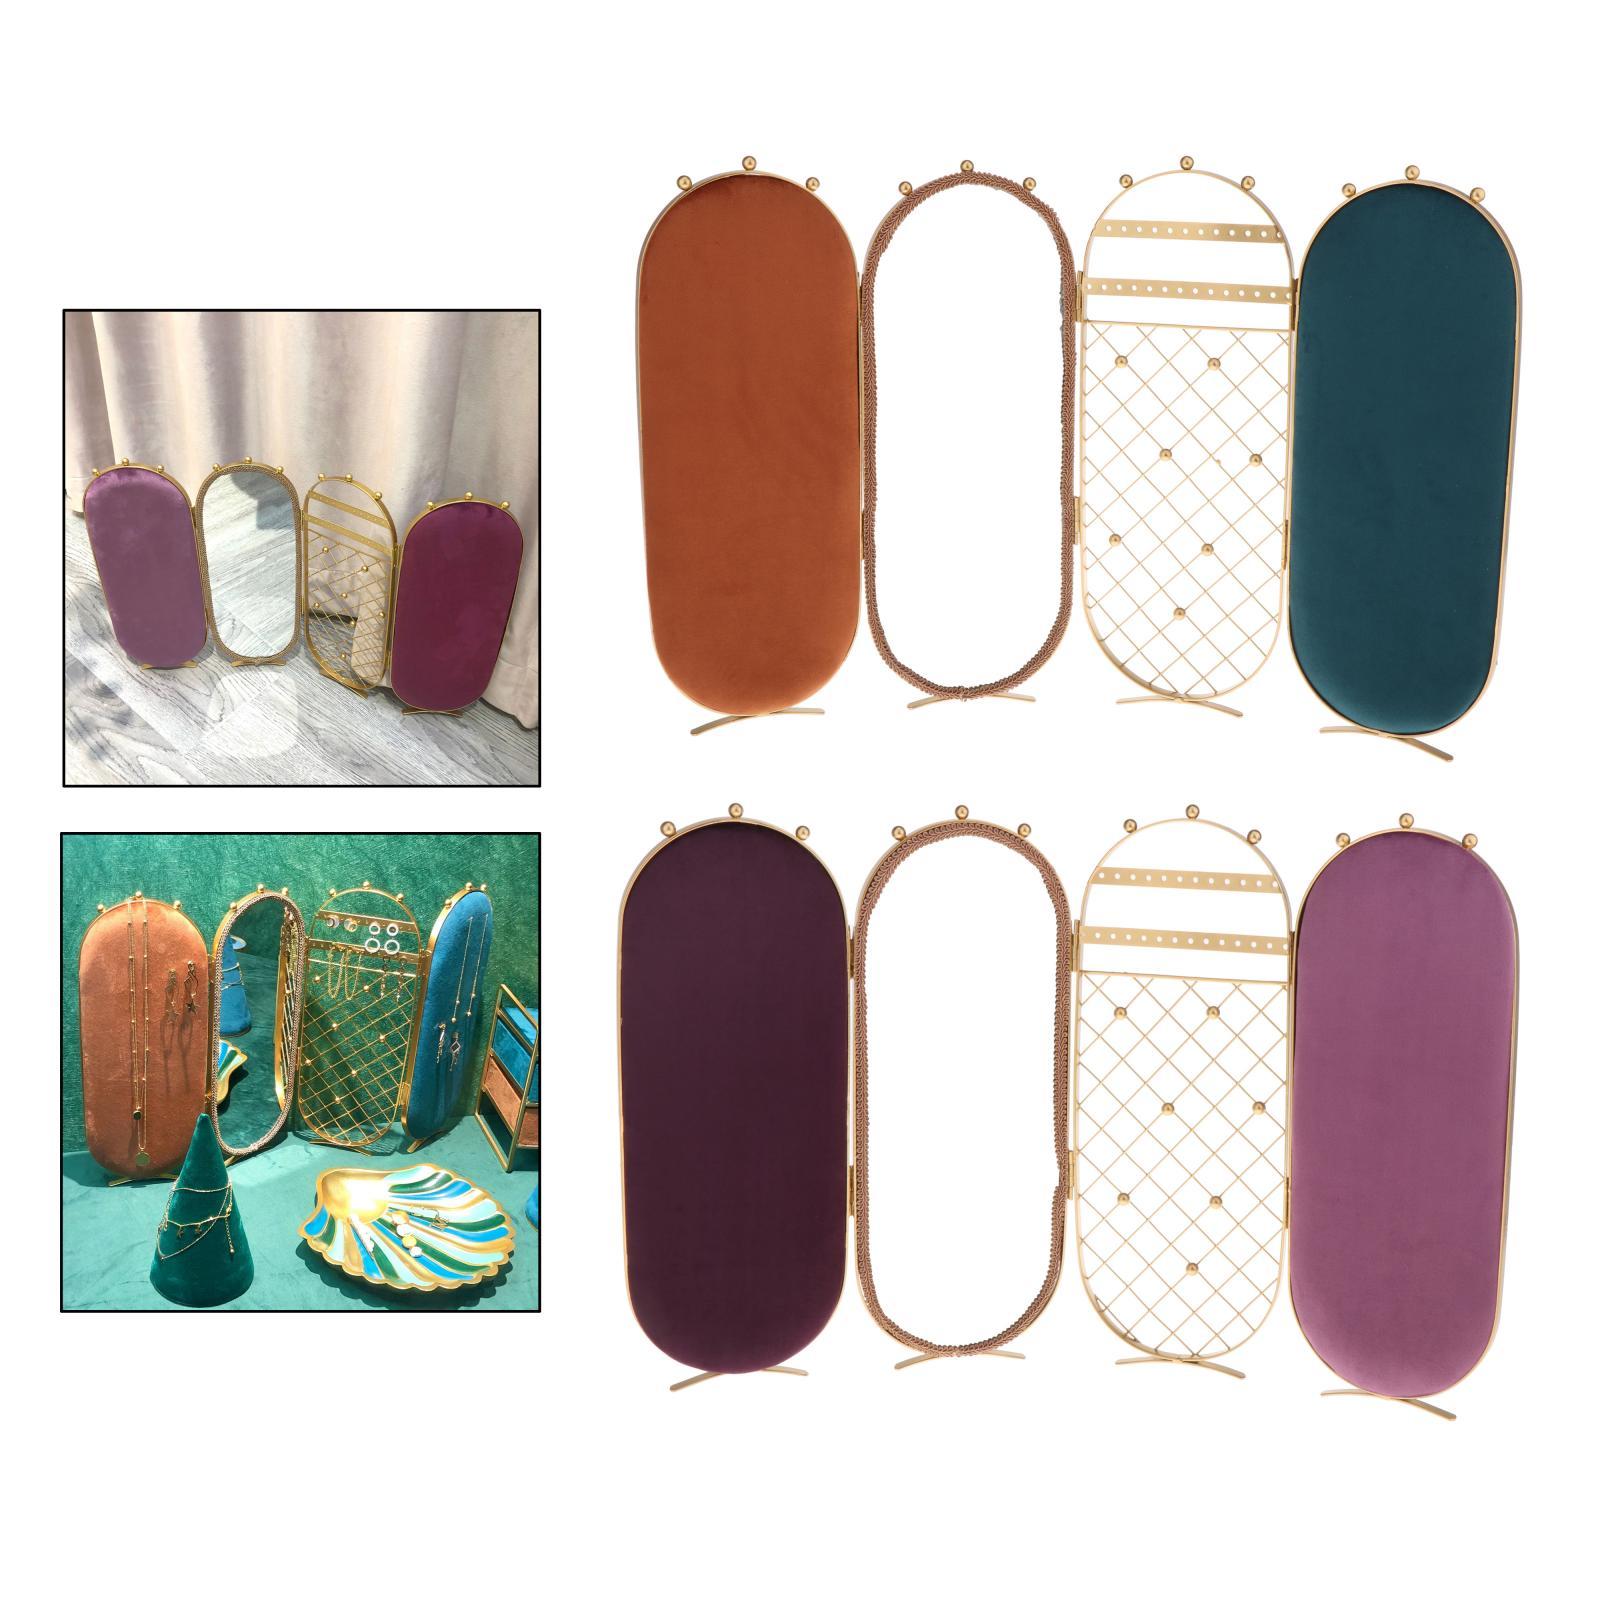 Jewelry Shelf Foldable Necklaces Hanging Holder Organizer Mirror Home Decor